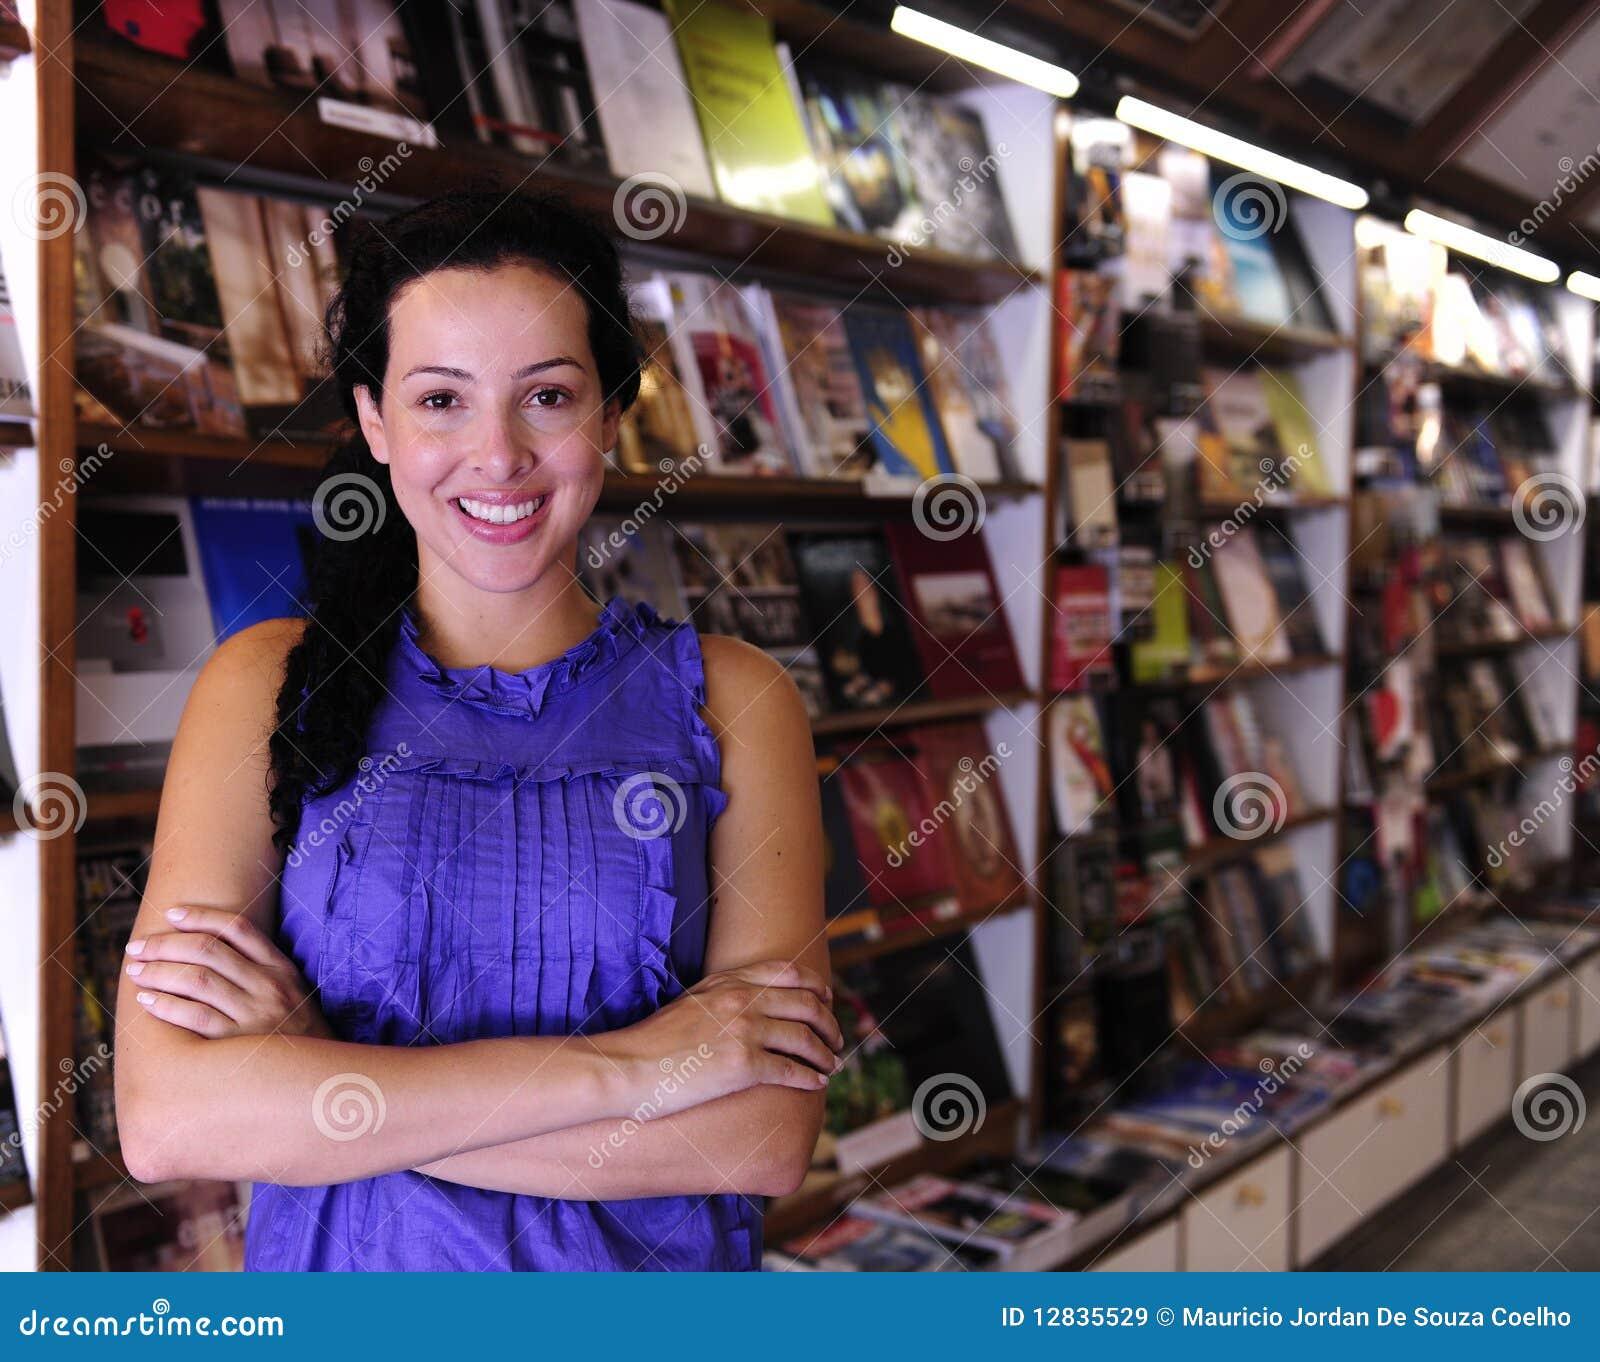 Proprietario felice di una libreria